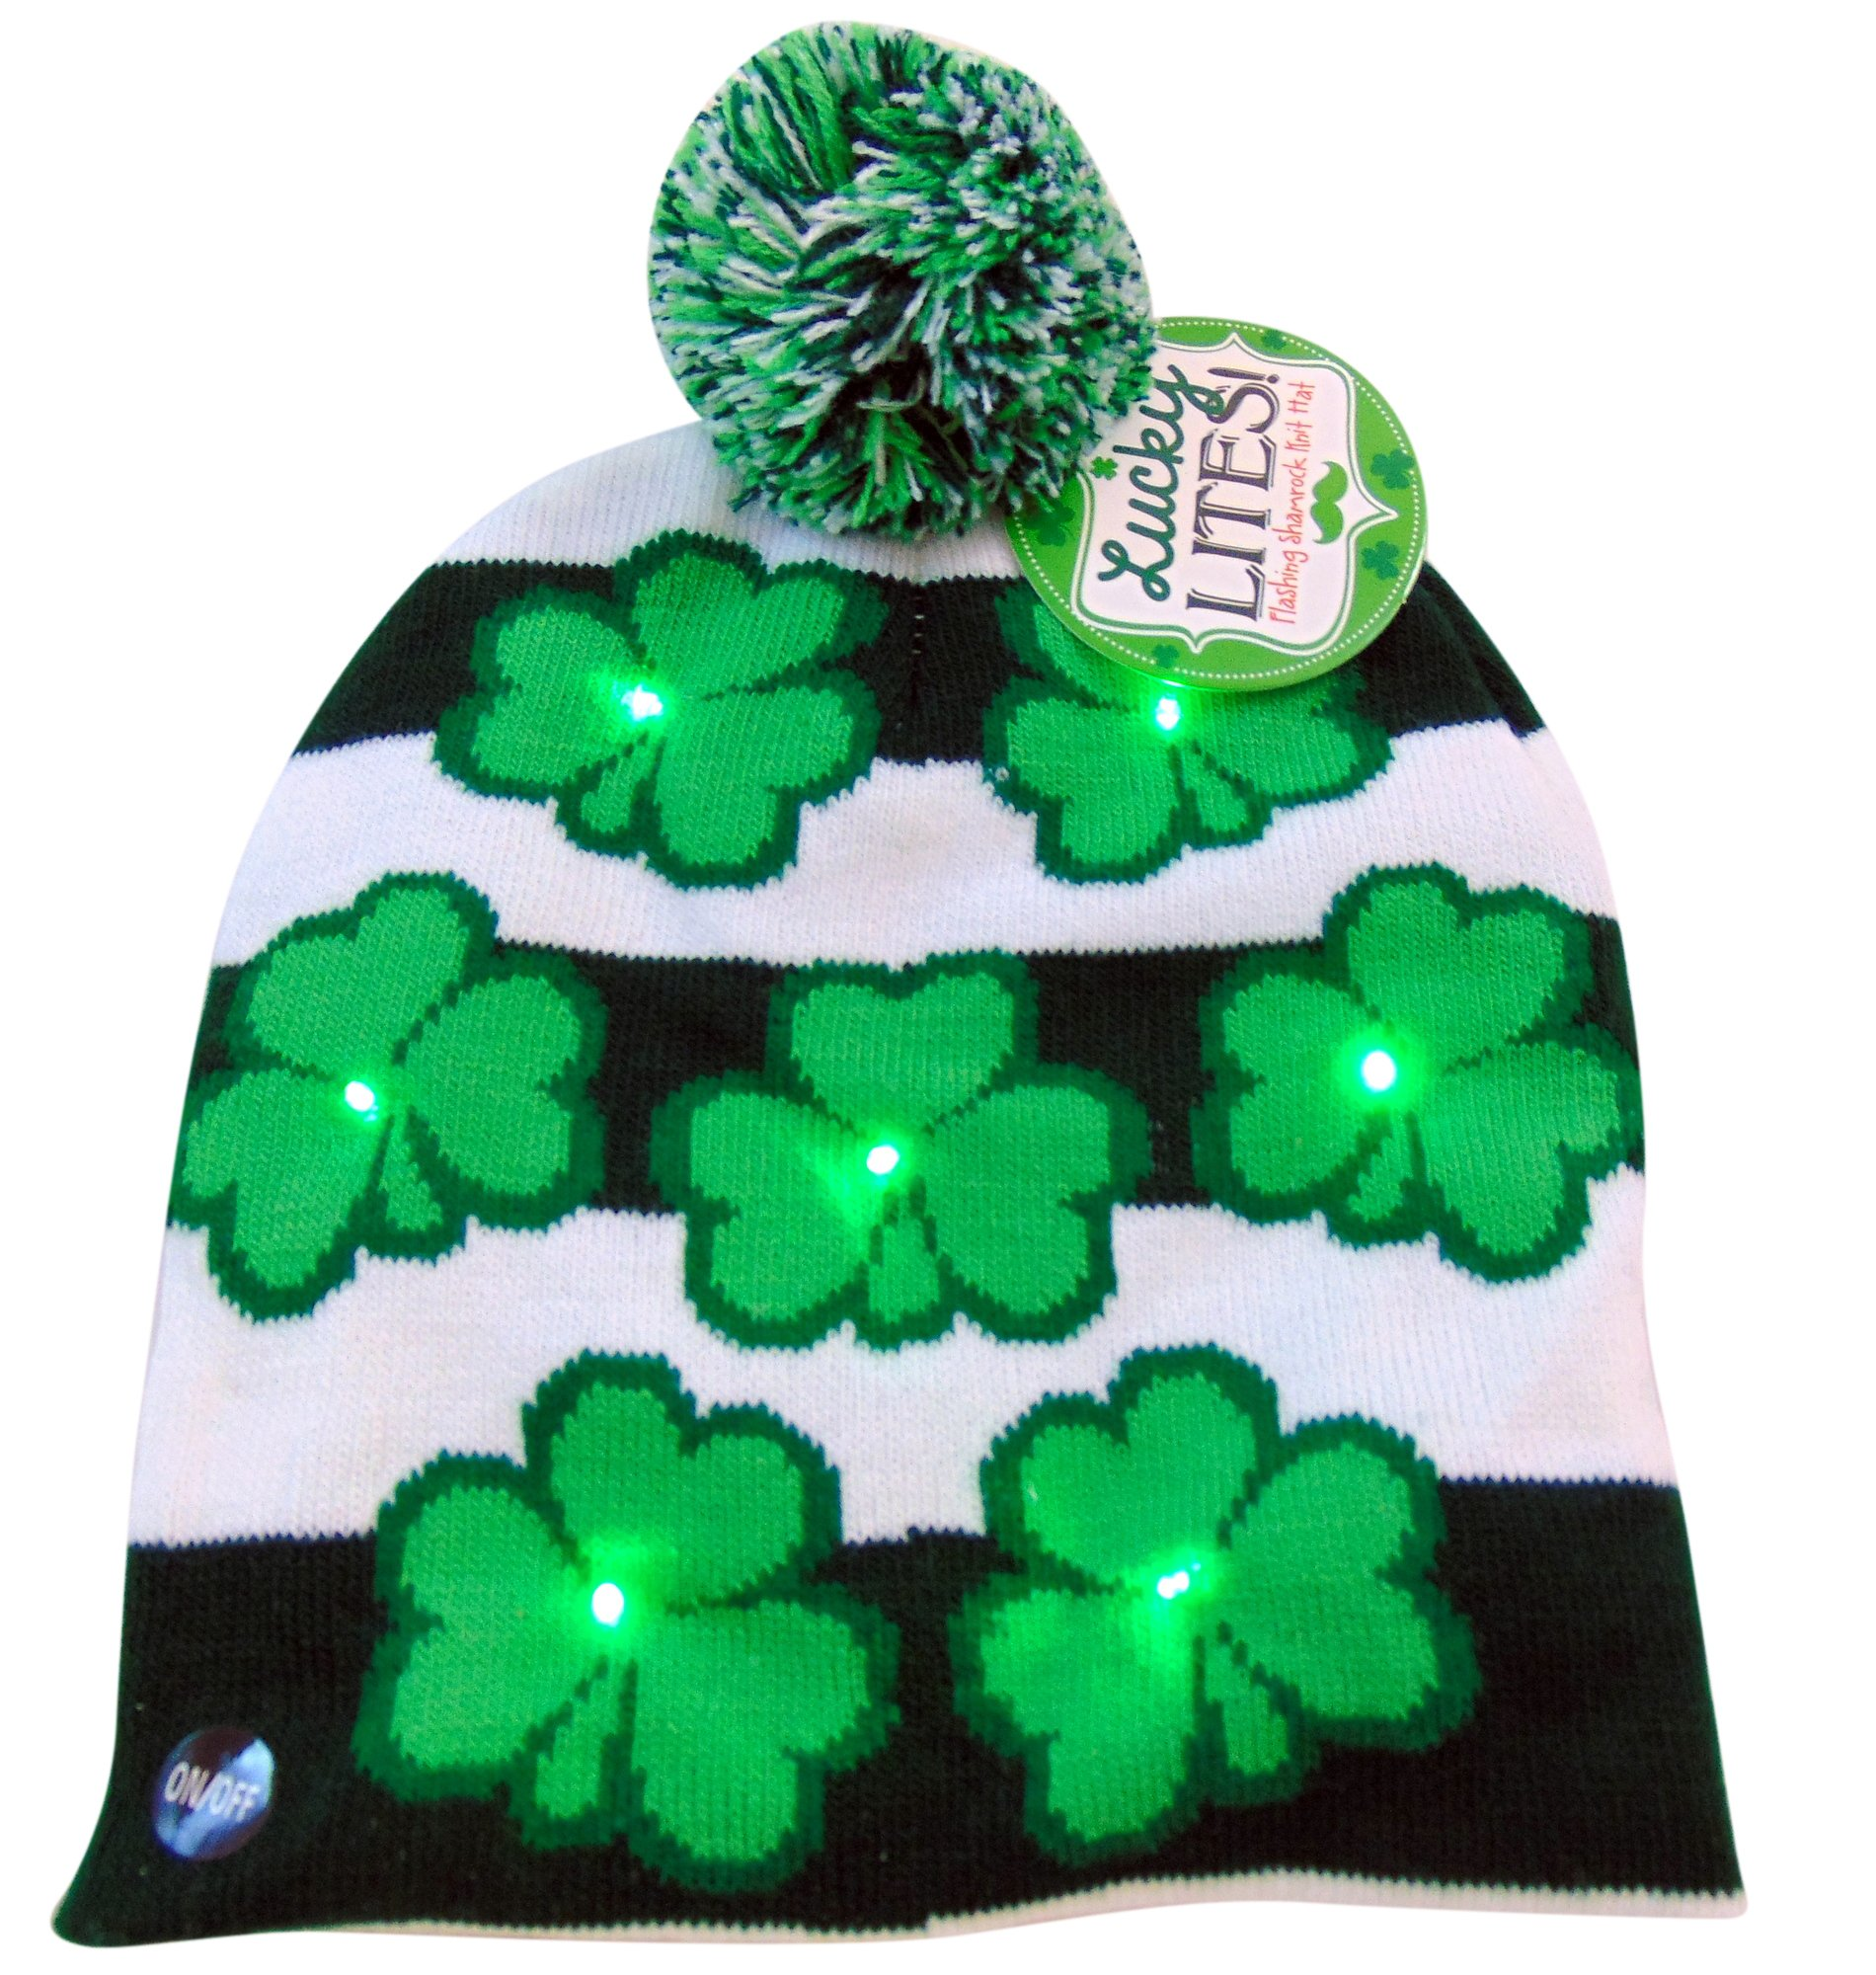 386db140cdedb0 DM Imports St Patricks Day Irish Light Up Beanie Skull Cap with ...